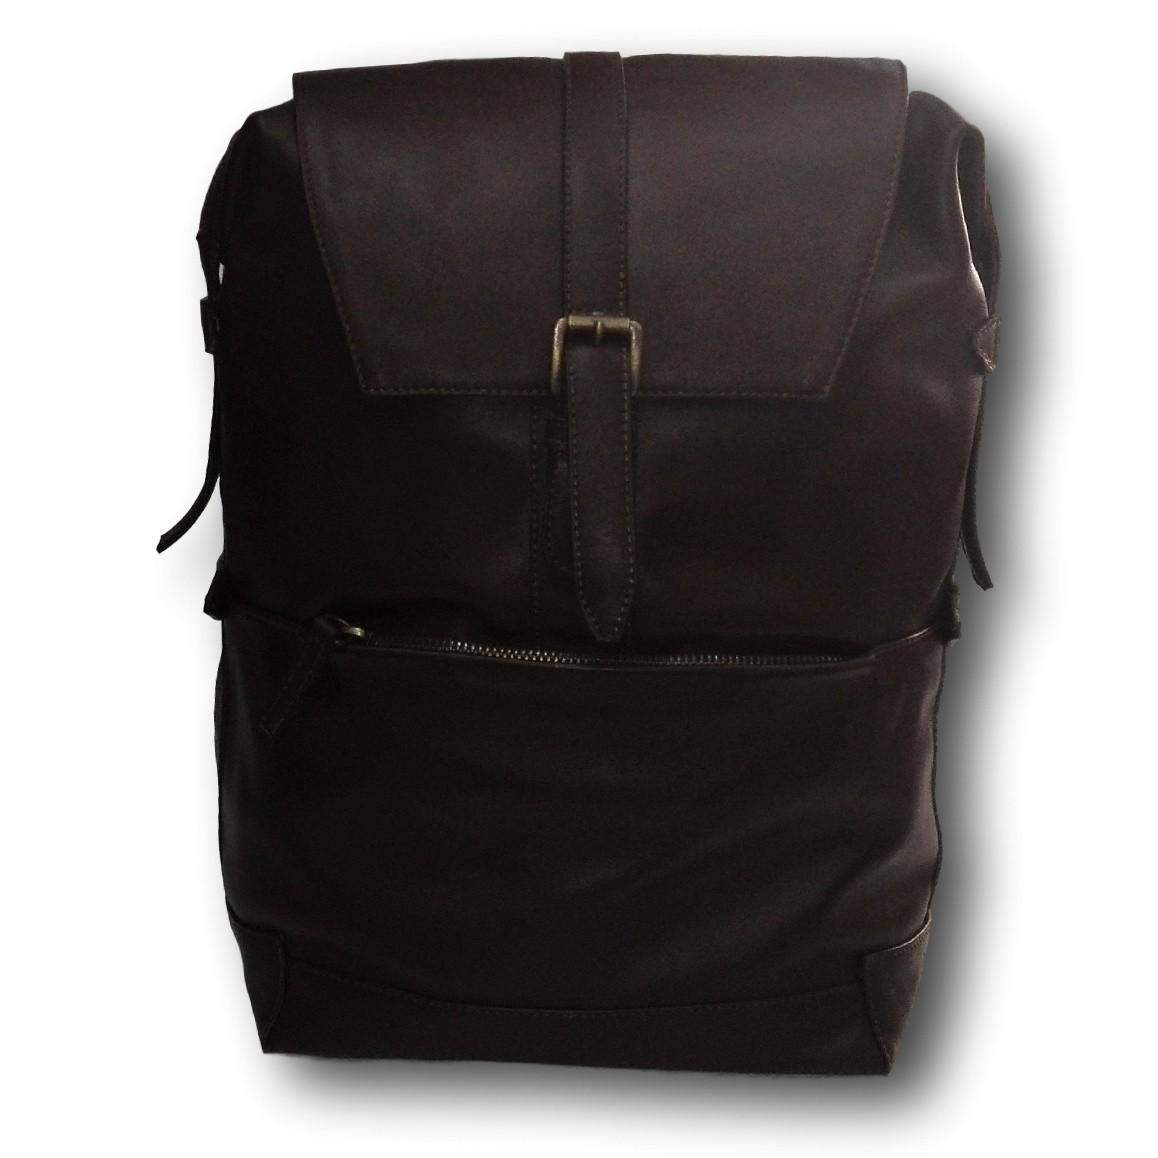 vendita calda online ec4d6 d717d Zainetto per uomo in vera pelle marrone